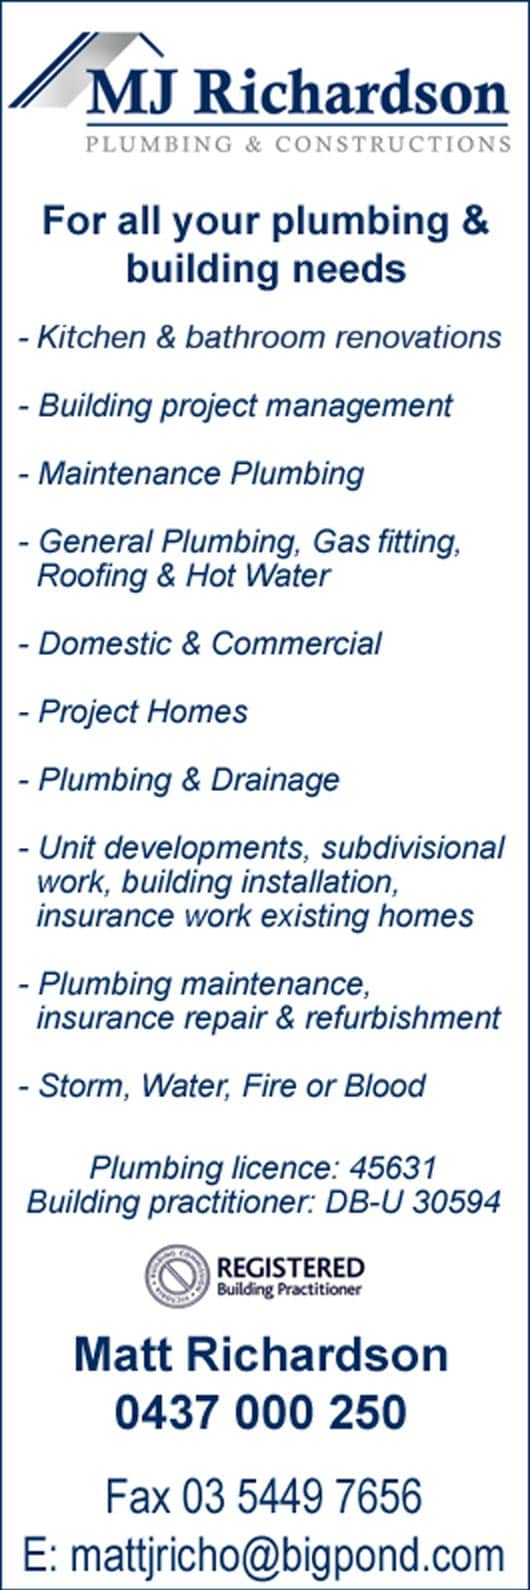 Bathroom Renovations Bendigo mj richardson plumbing & constructions - plumbers & gas fitters